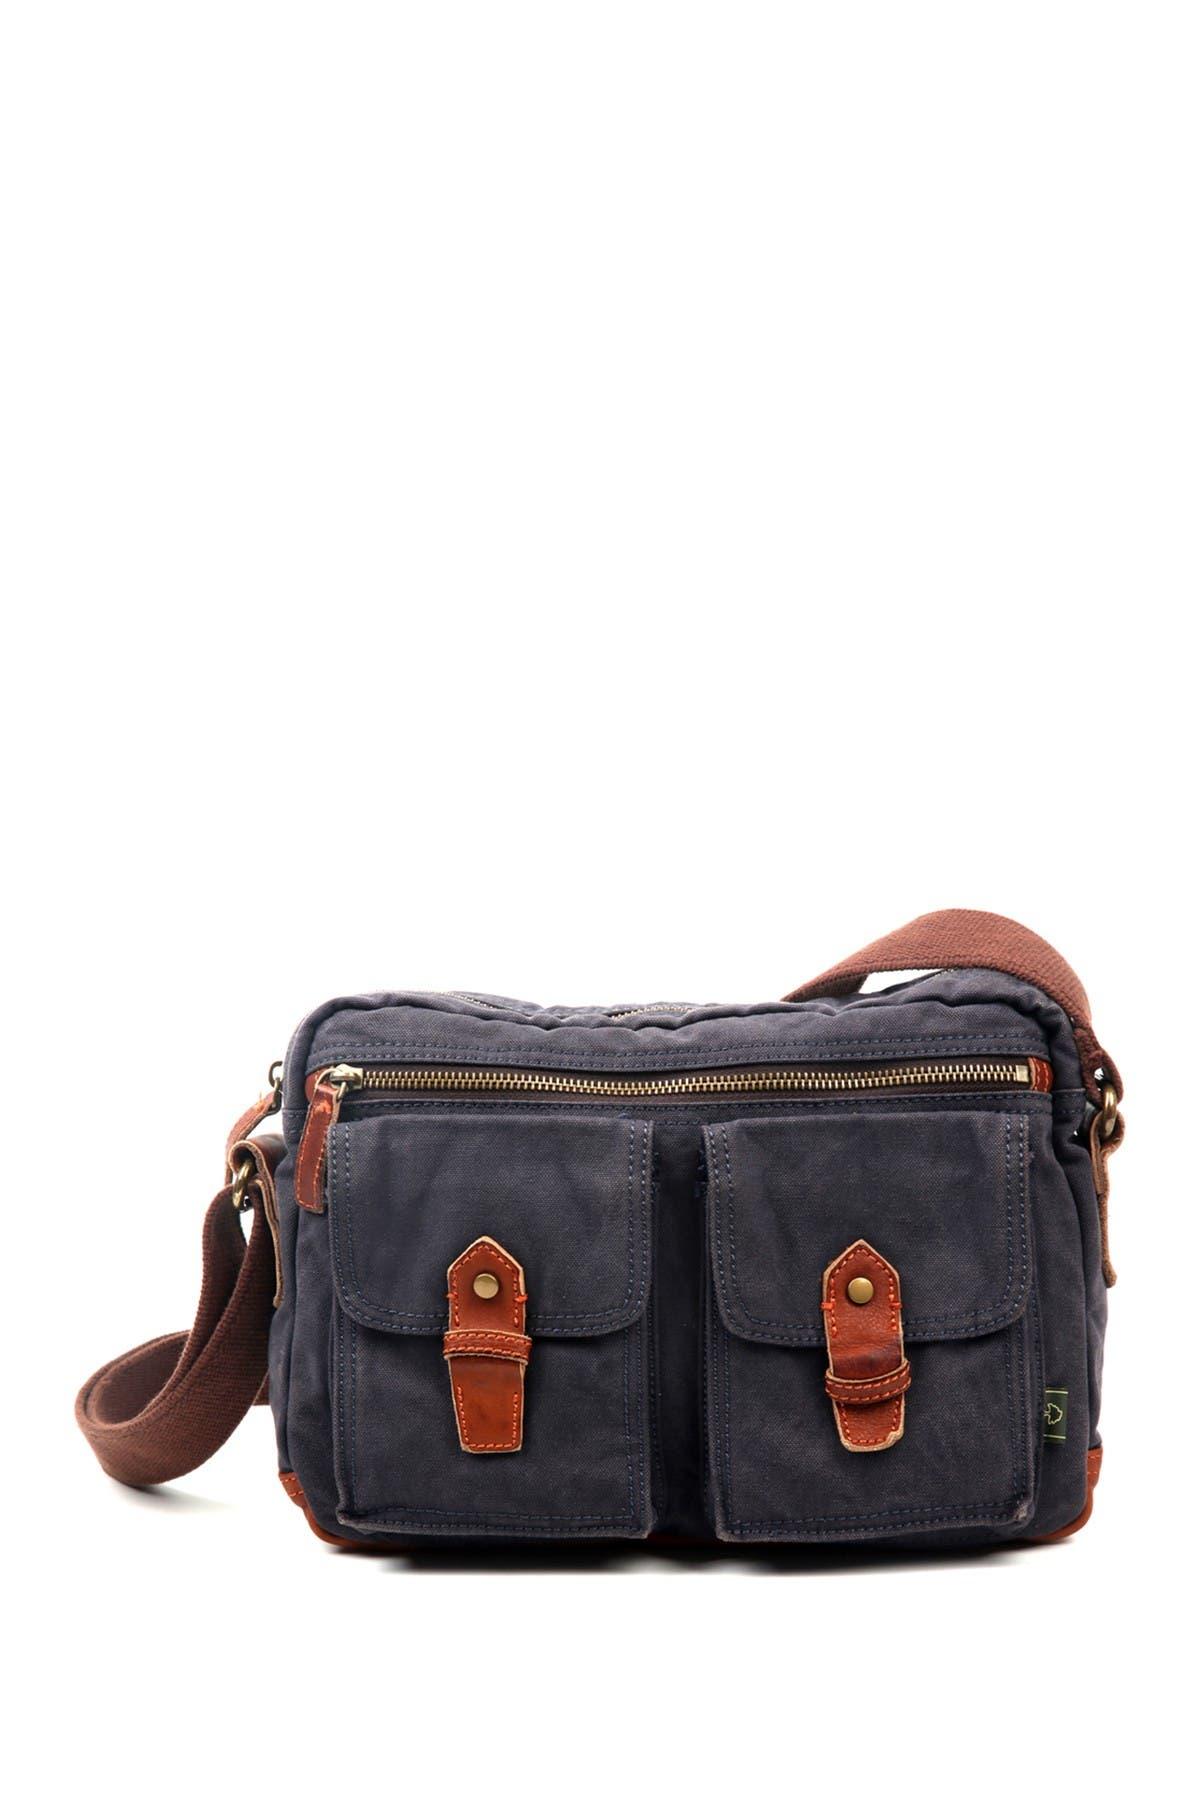 Image of TSD Trail Breeze Canvas Crossbody Mail Bag